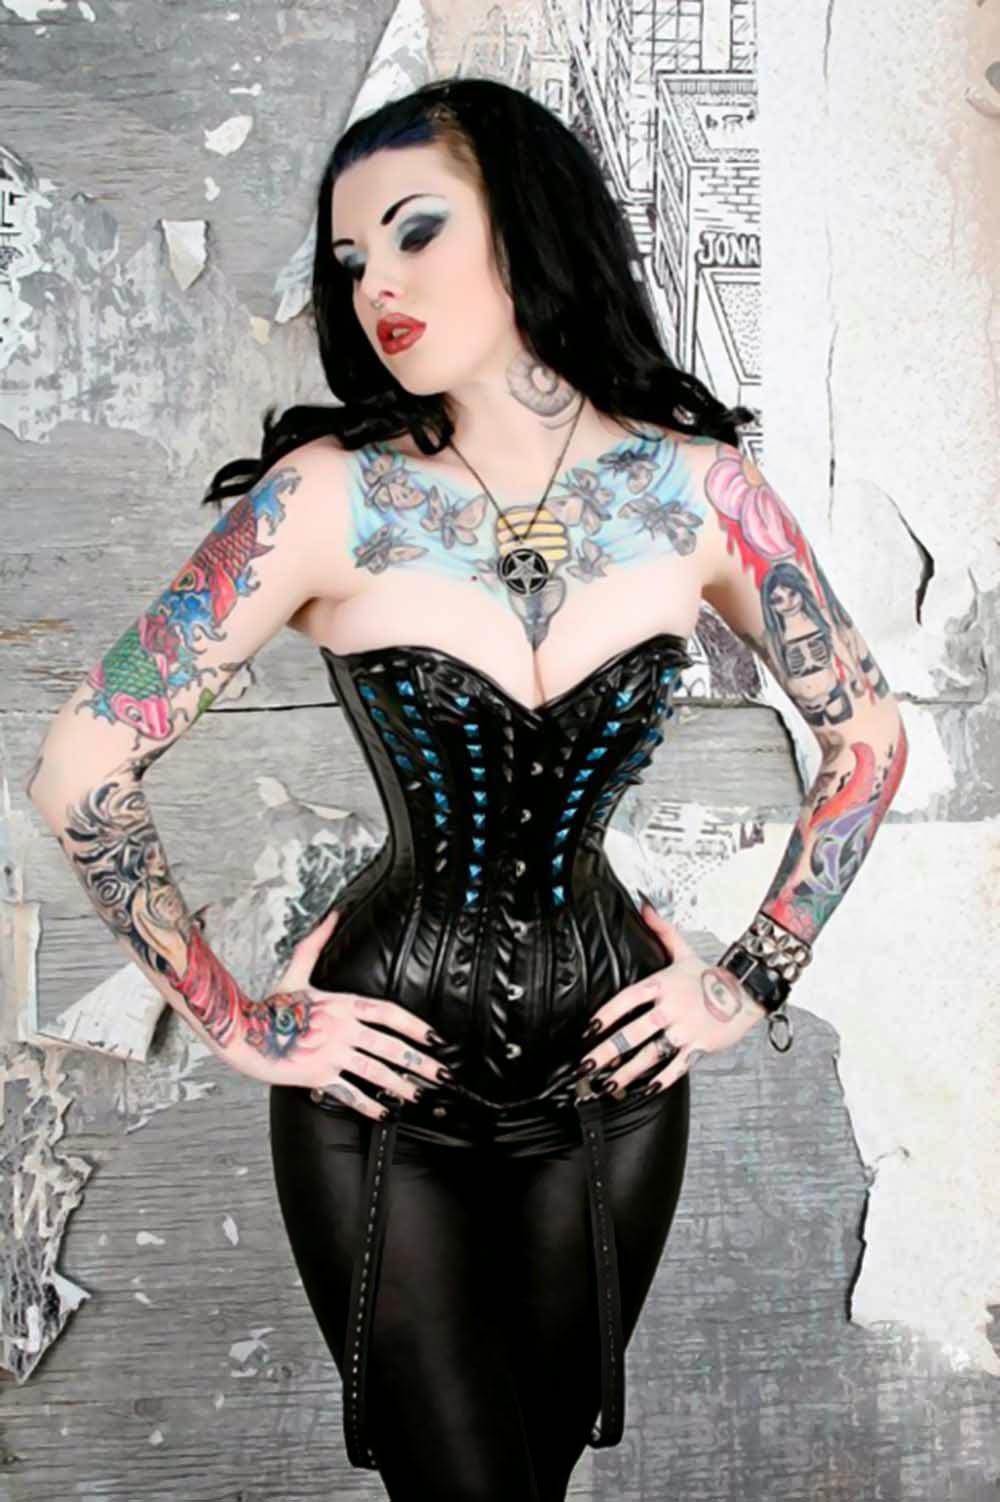 corset+rules+(69).jpg